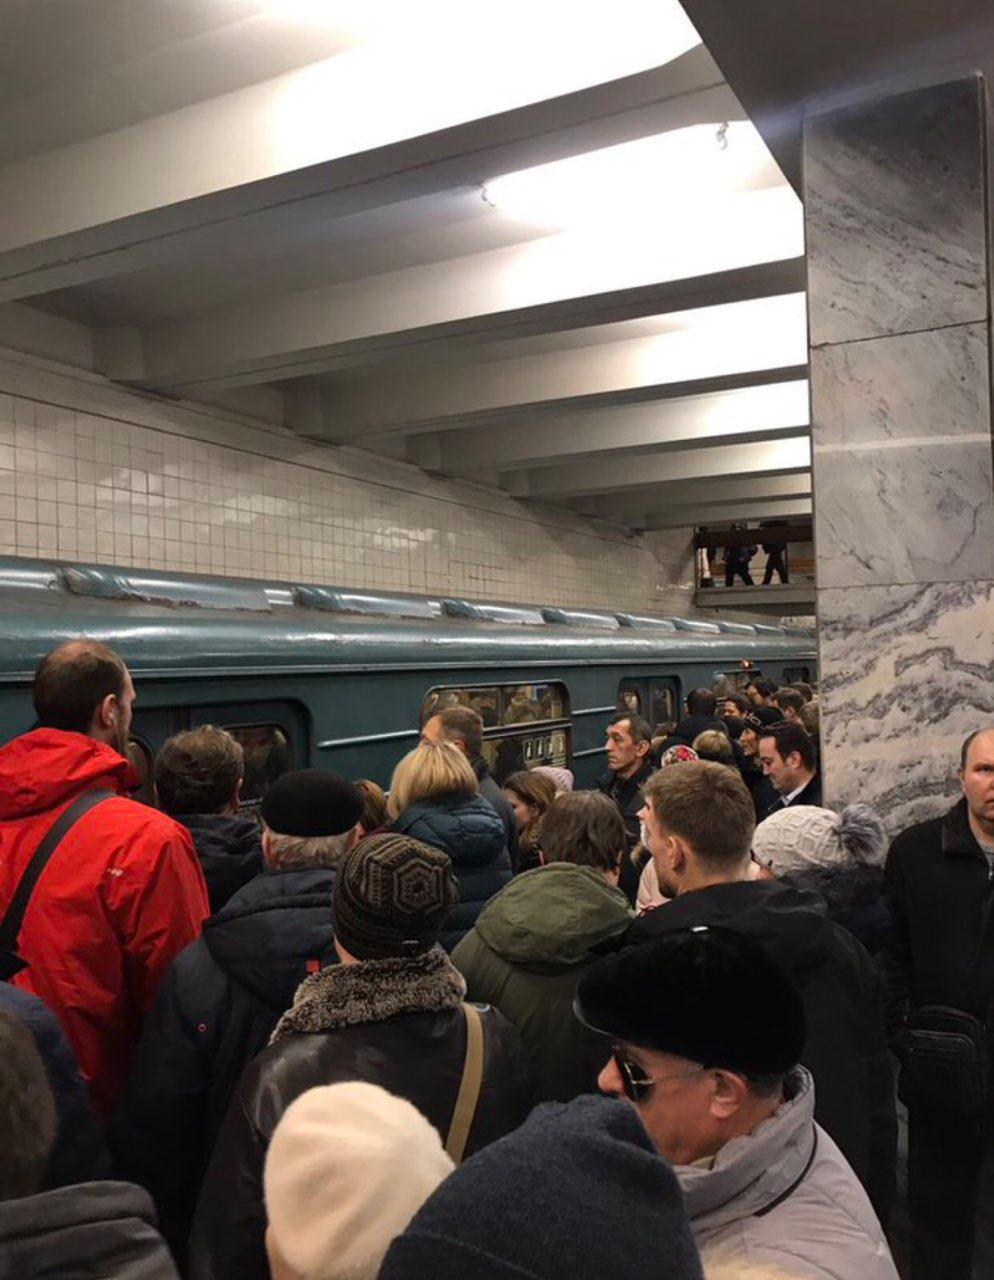 Движение навсех линиях метро введено вграфик после сбоя